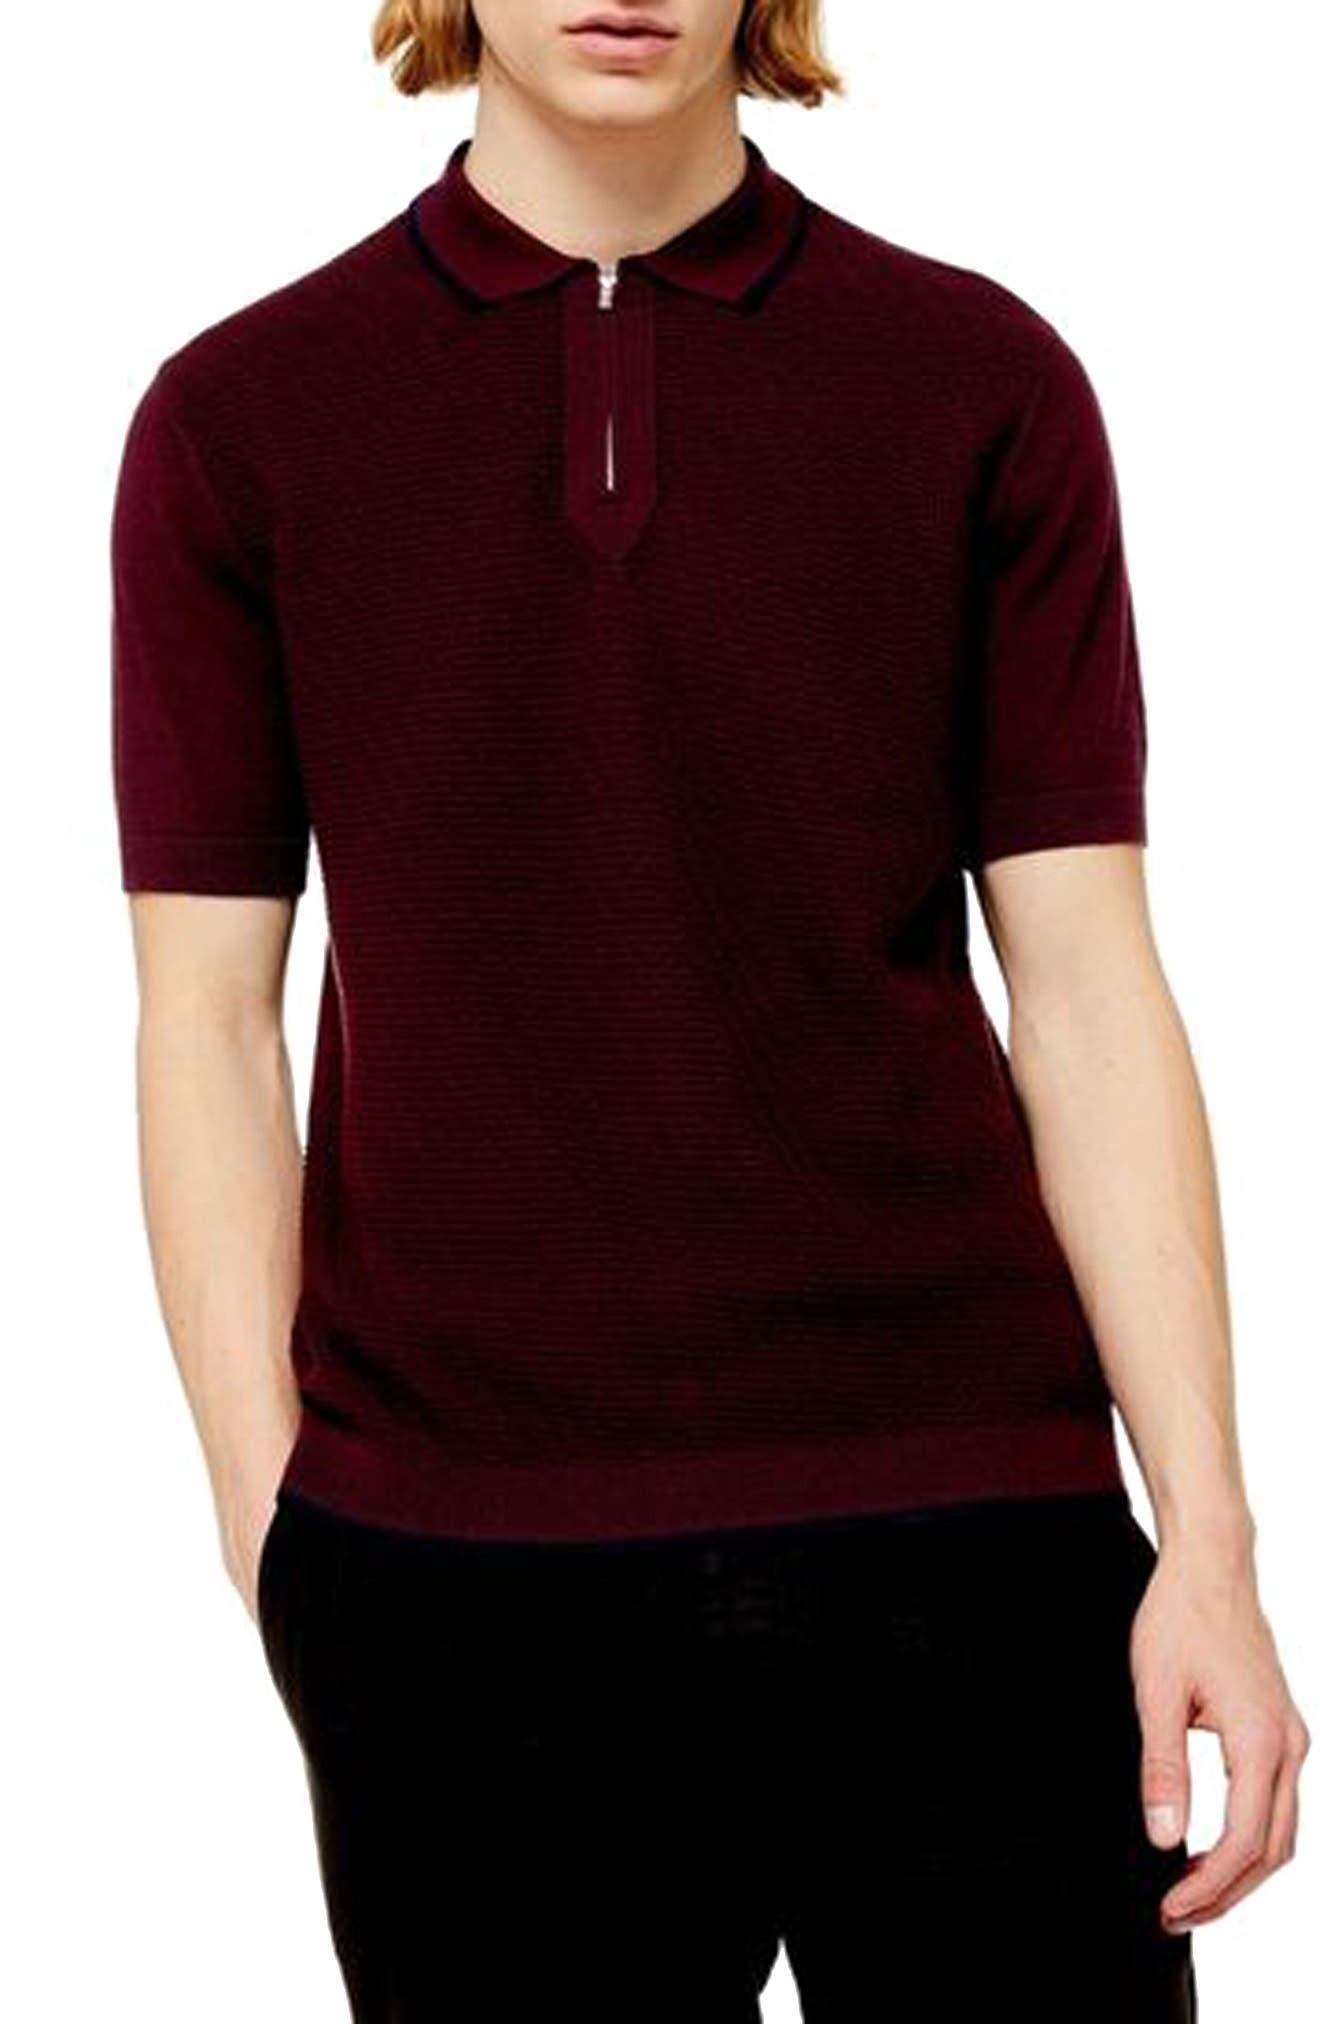 1950s Men's Clothing Mens Topman Trim Fit Zip Sweater Polo Size XX-Large - Burgundy $22.50 AT vintagedancer.com